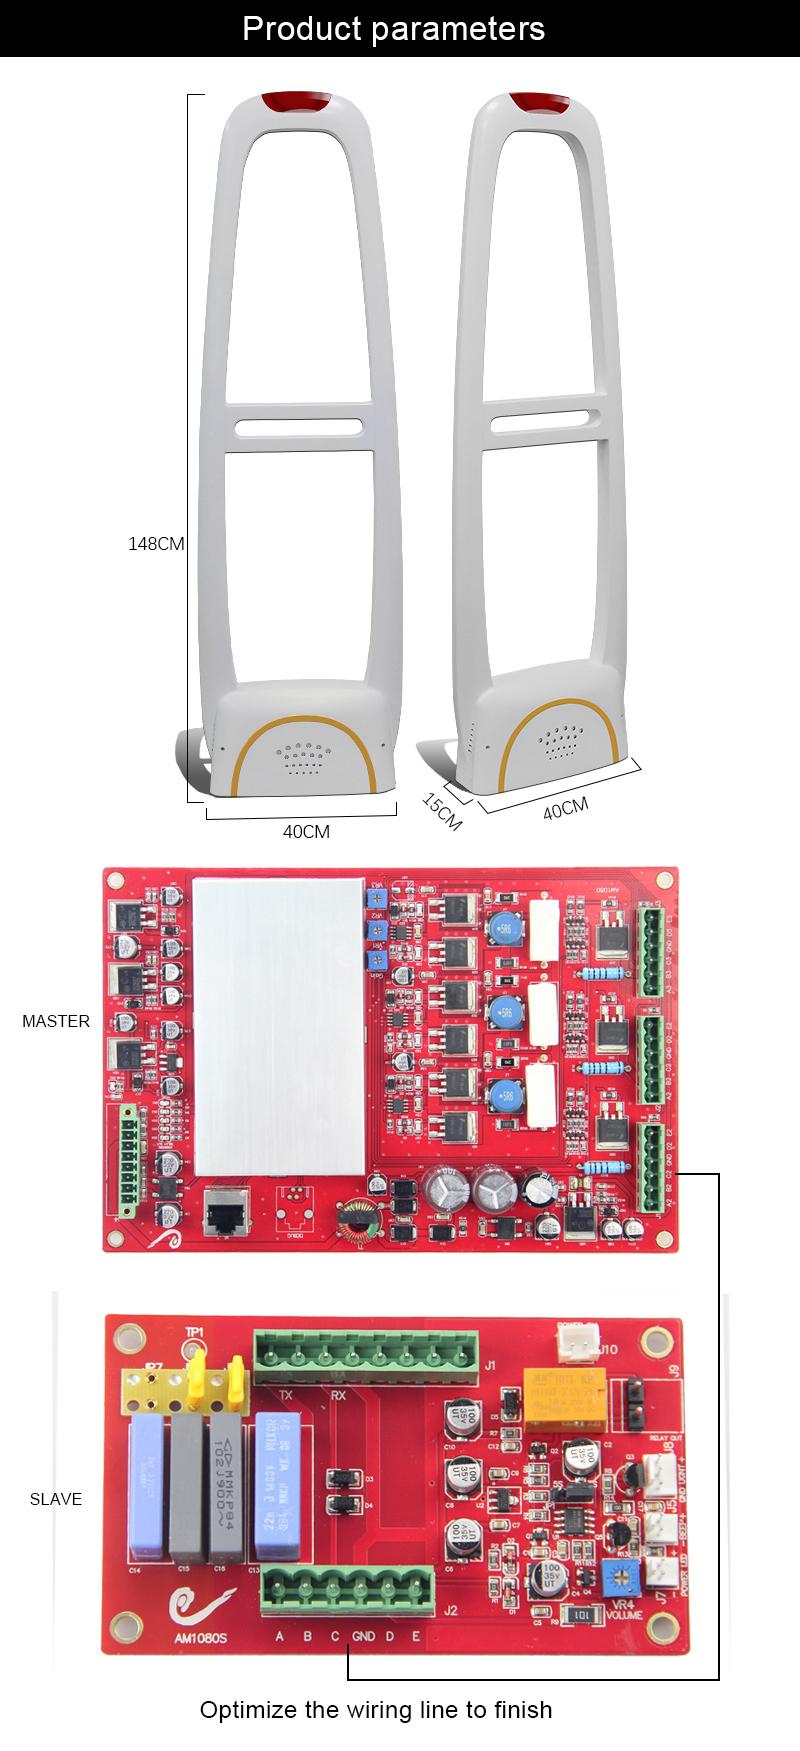 58 Khz antena sistema eas am anti